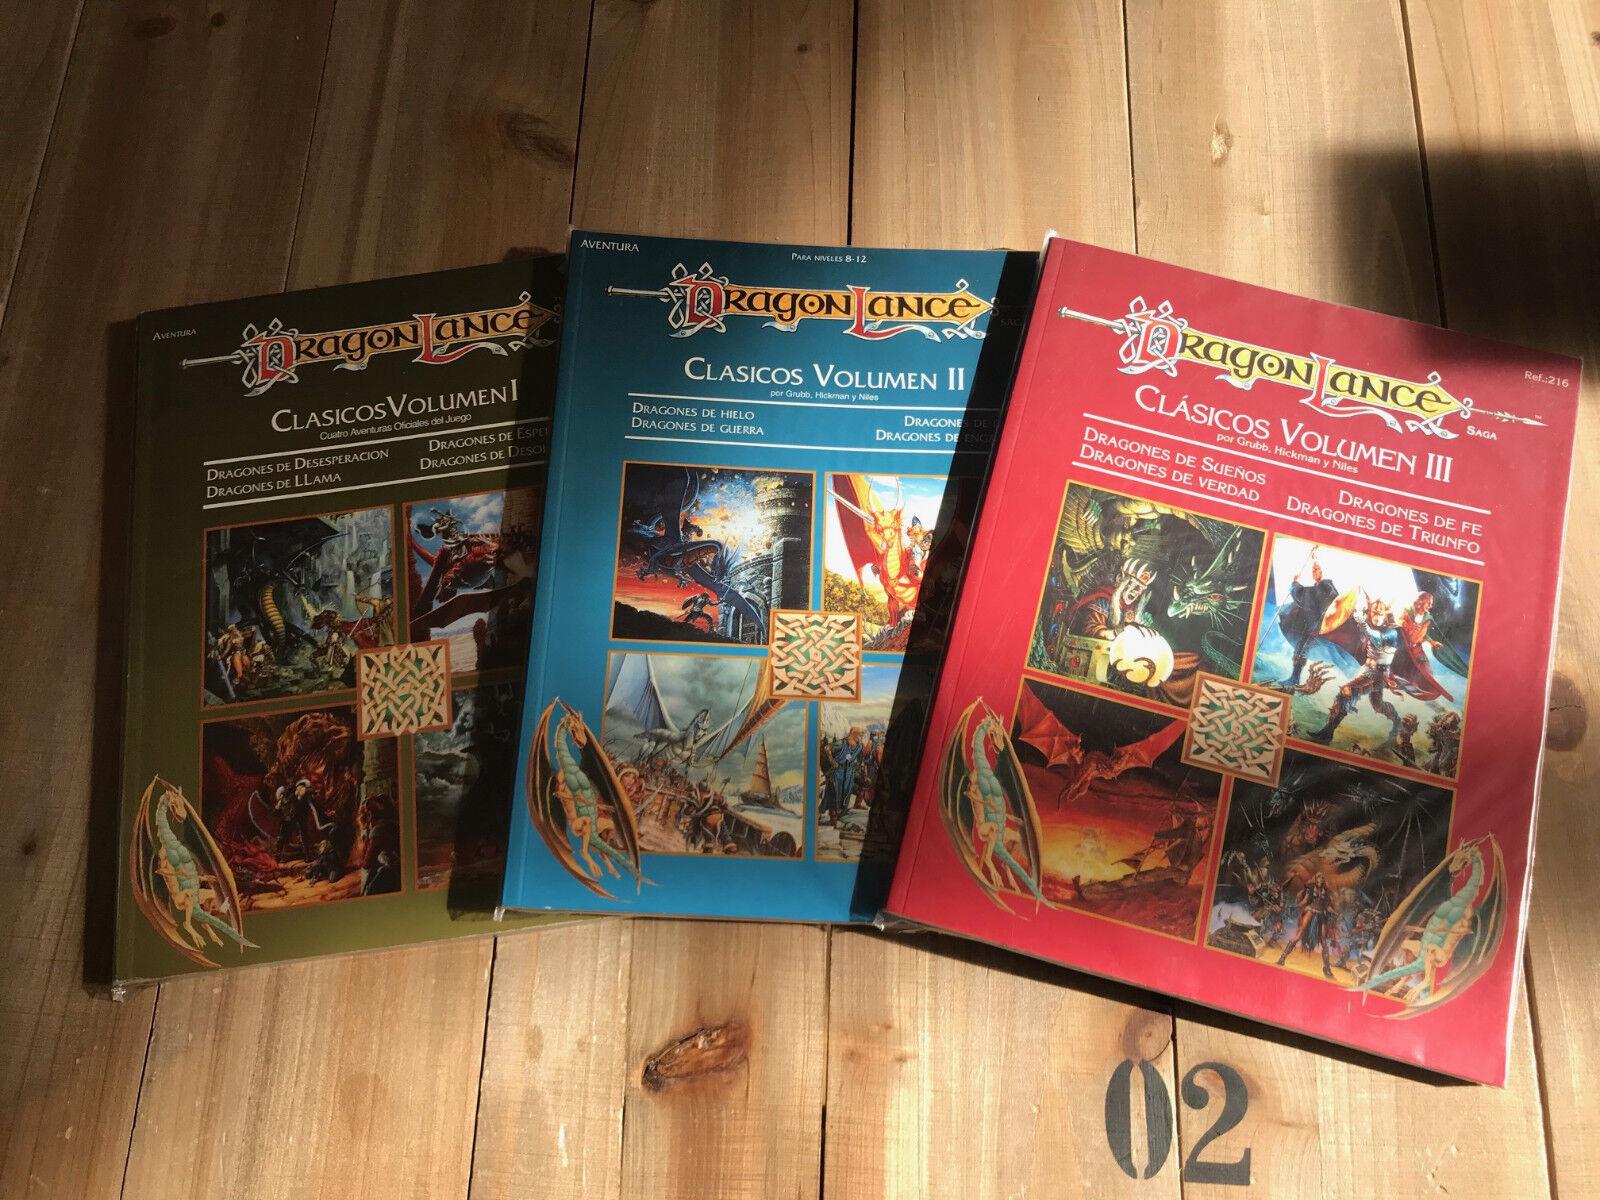 Advanced Dungeons & Dragons DRAGONLANCE - CLASICOS TRILOGIA TRILOGIA TRILOGIA - juego rol - ZINCO 80ead2